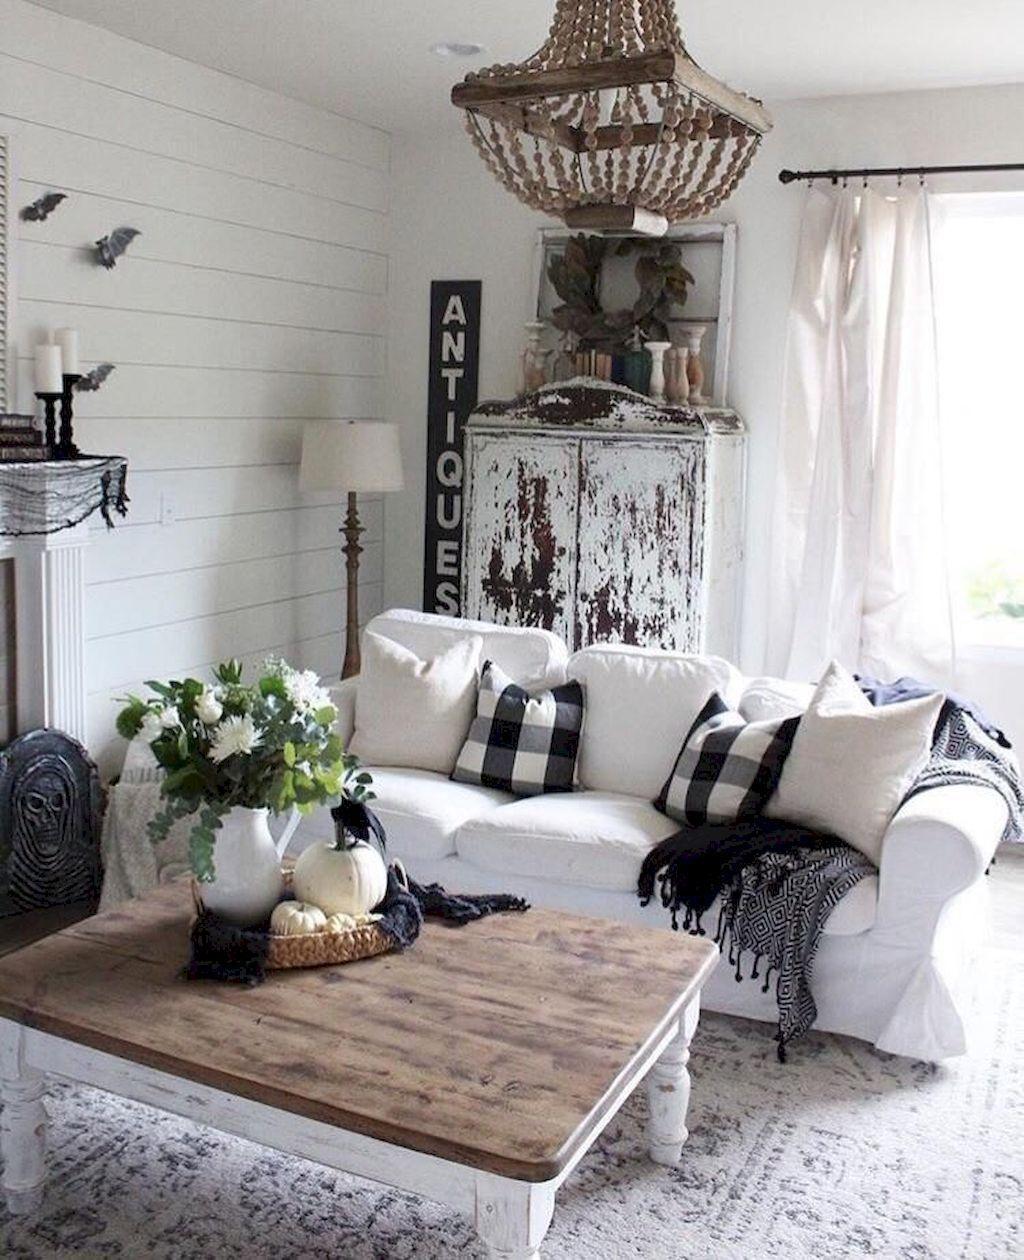 04 cozy modern farmhouse living room decor ideas | Modern ...